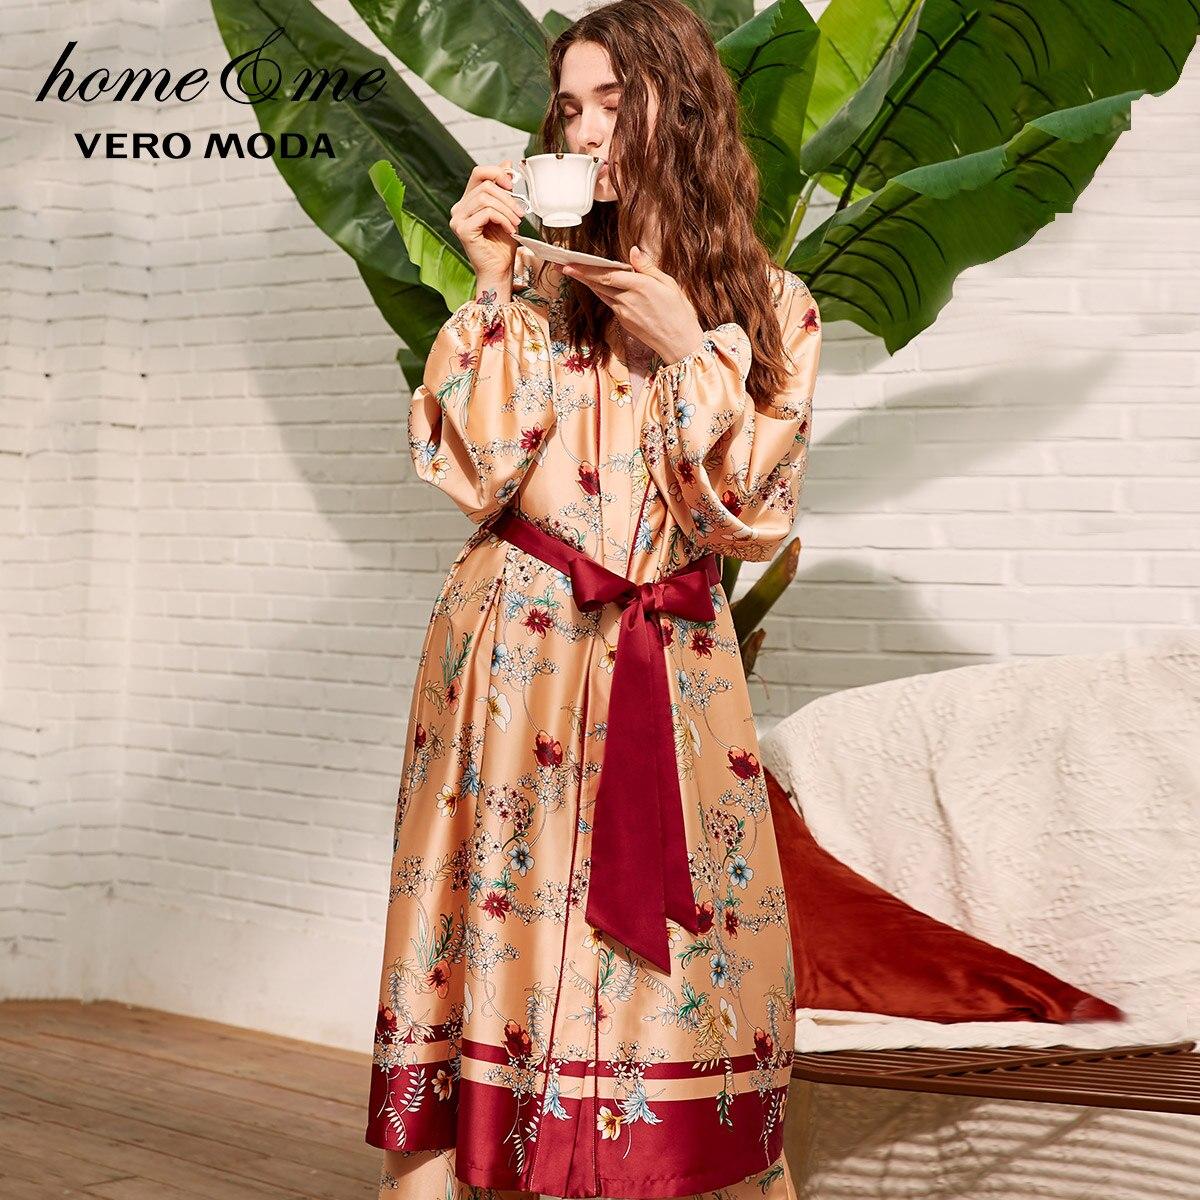 Vero Moda 2019 New Women's Drapery Printed Nightgown Bridesmaid Bathrobe | 3183R1501